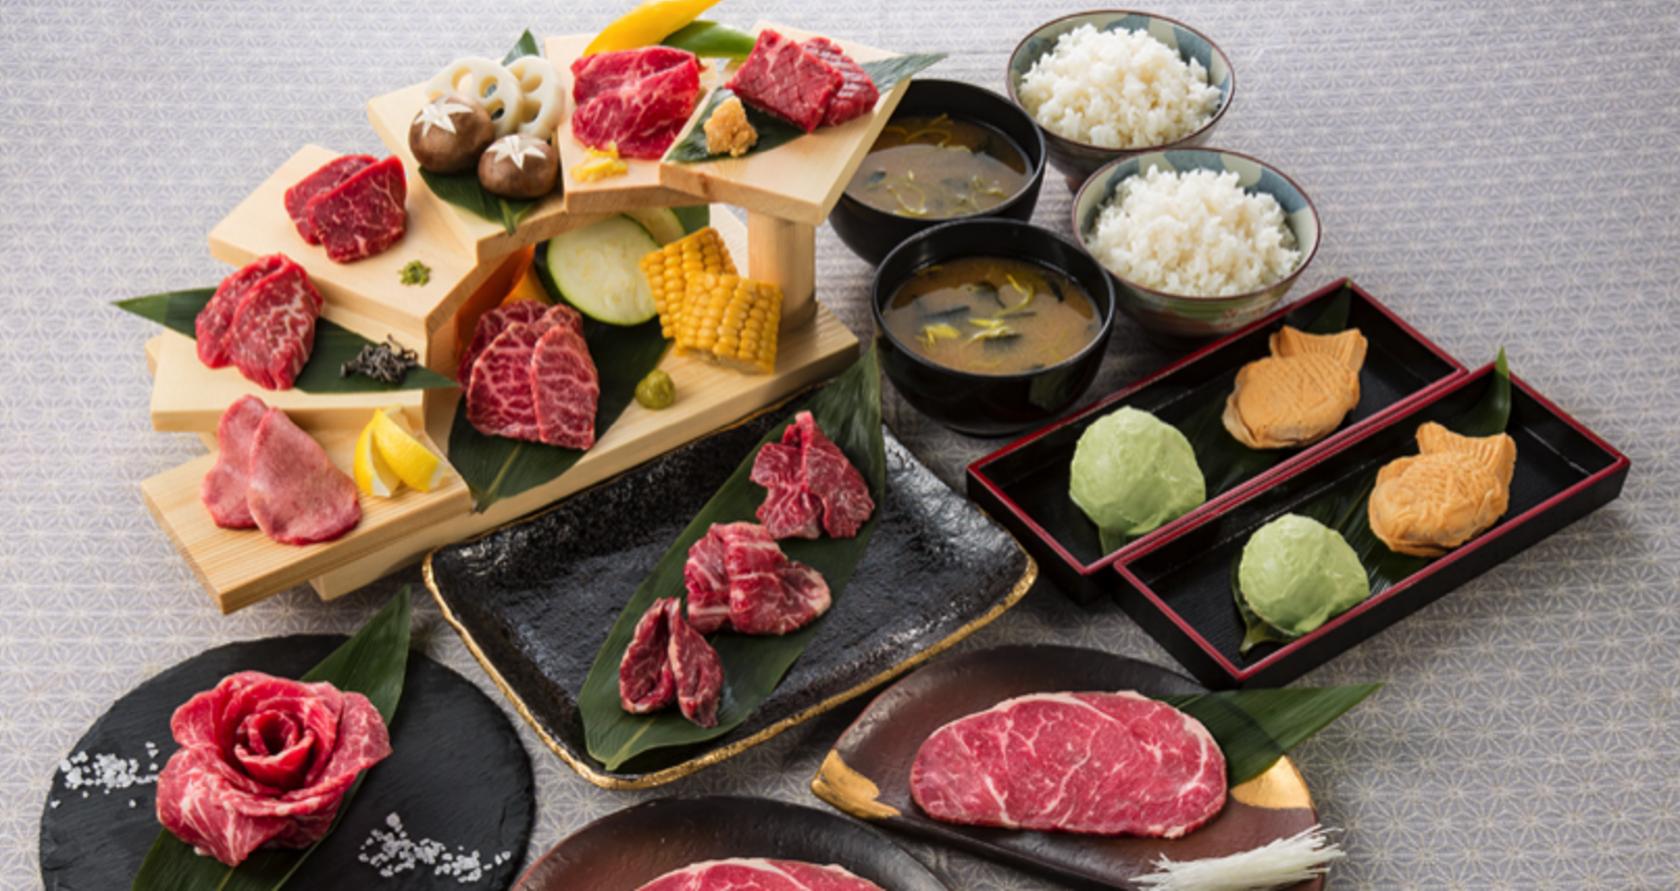 Ushido – Japanese BBQ - Das erste Yakiniku Restaurant in Berlin